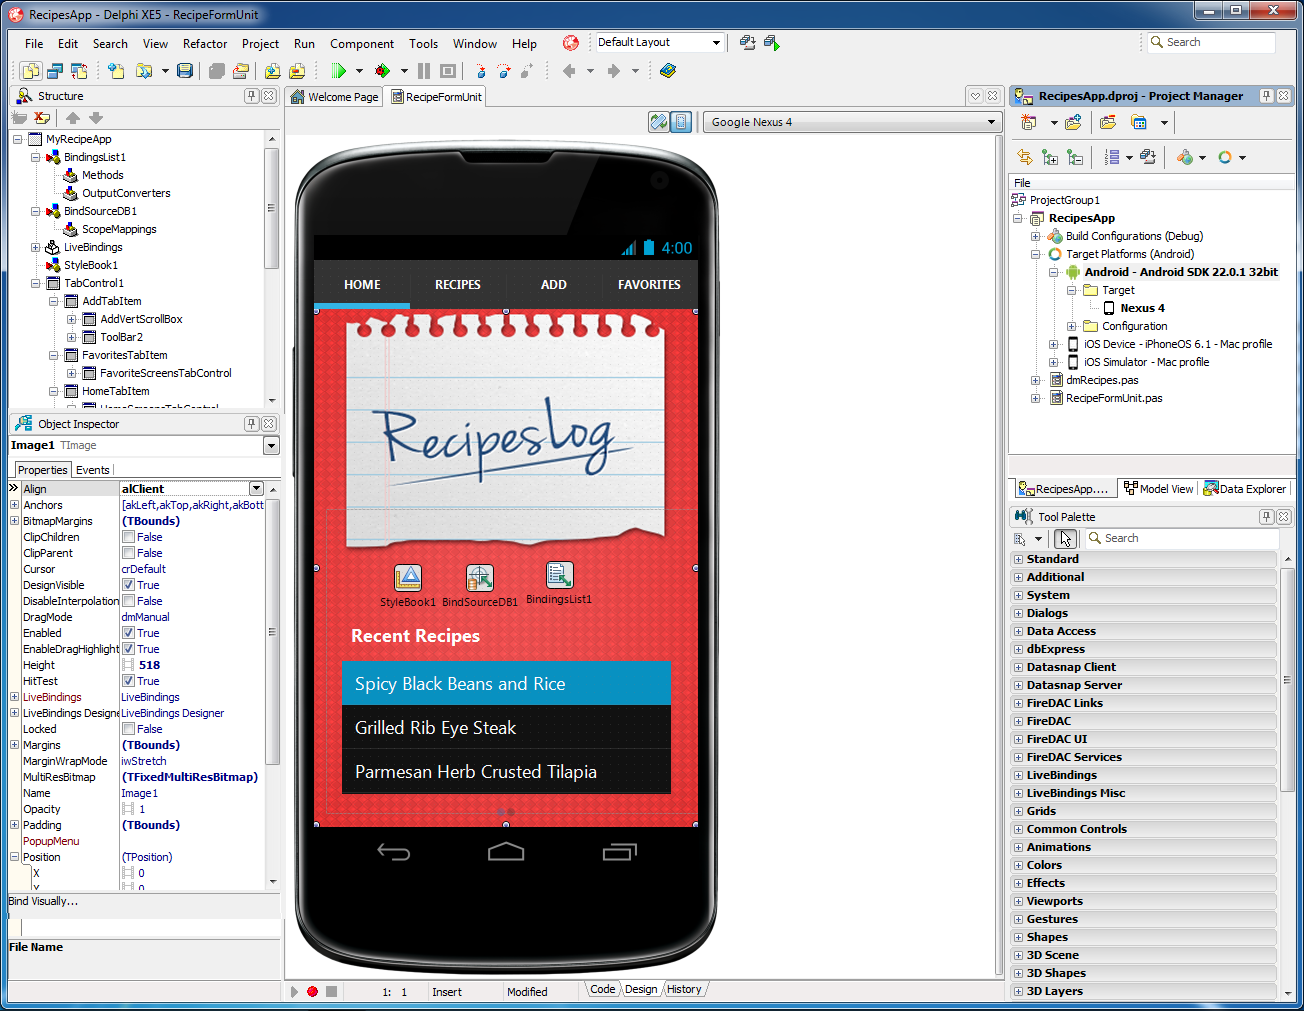 Delphi xe android сохранение в файл - b2bb